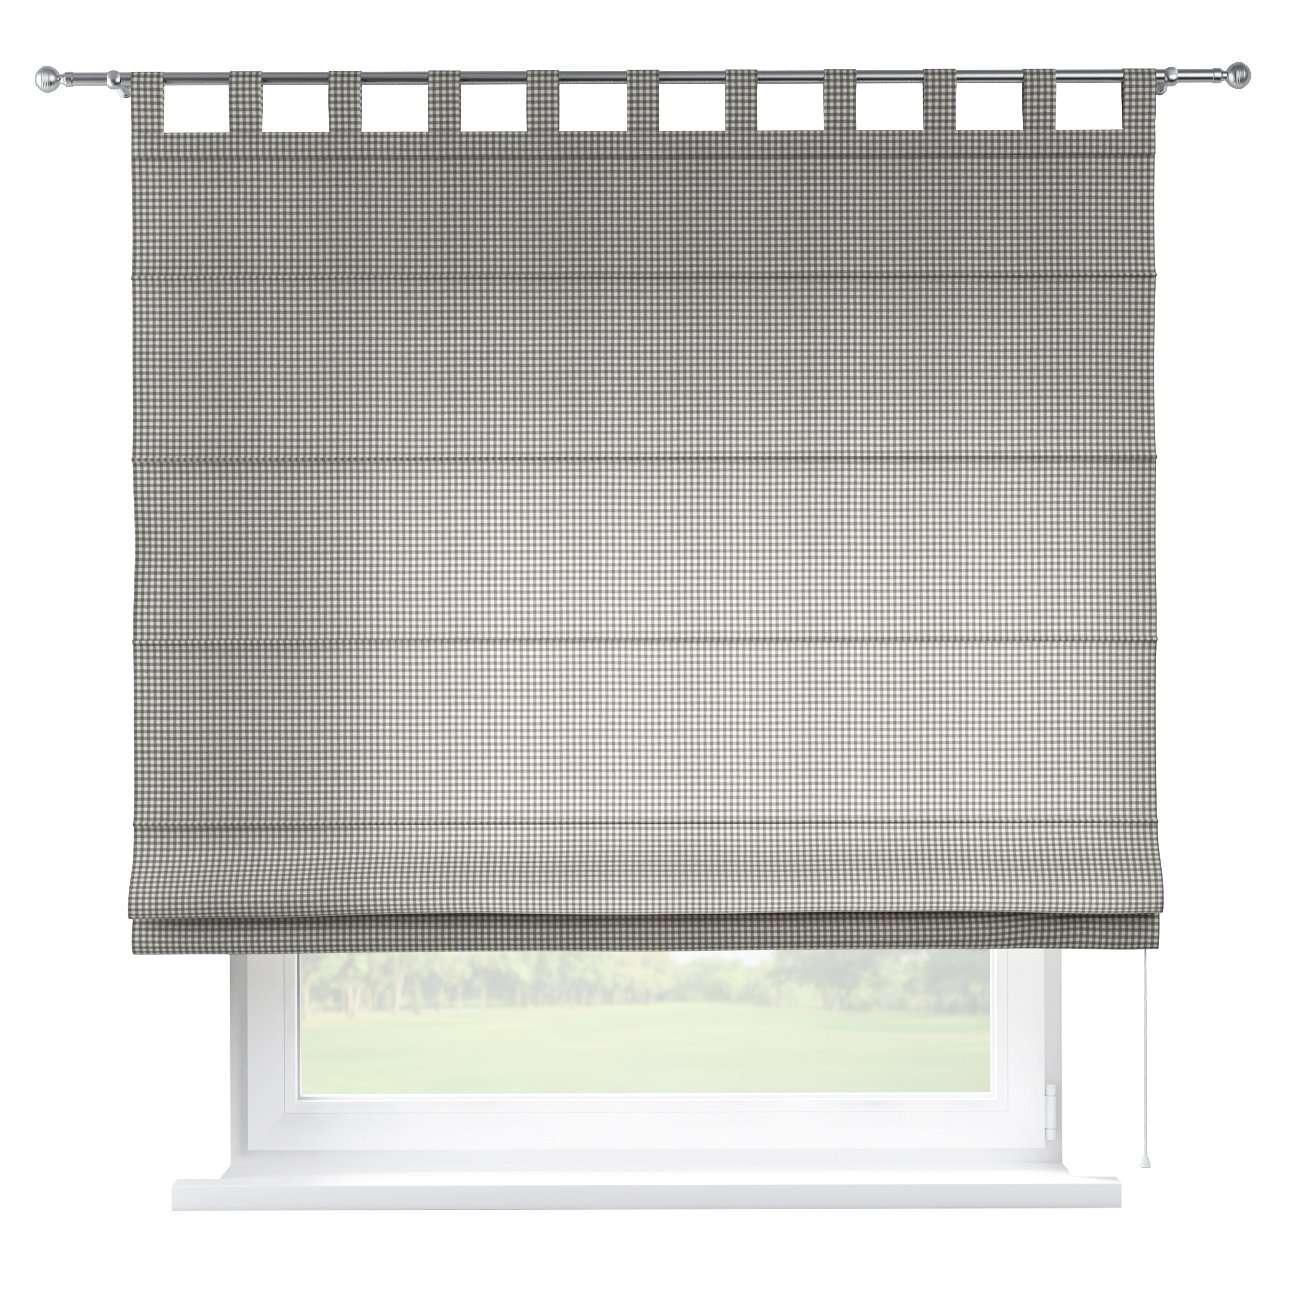 Verona tab top roman blind 80 x 170 cm (31.5 x 67 inch) in collection Quadro, fabric: 136-10